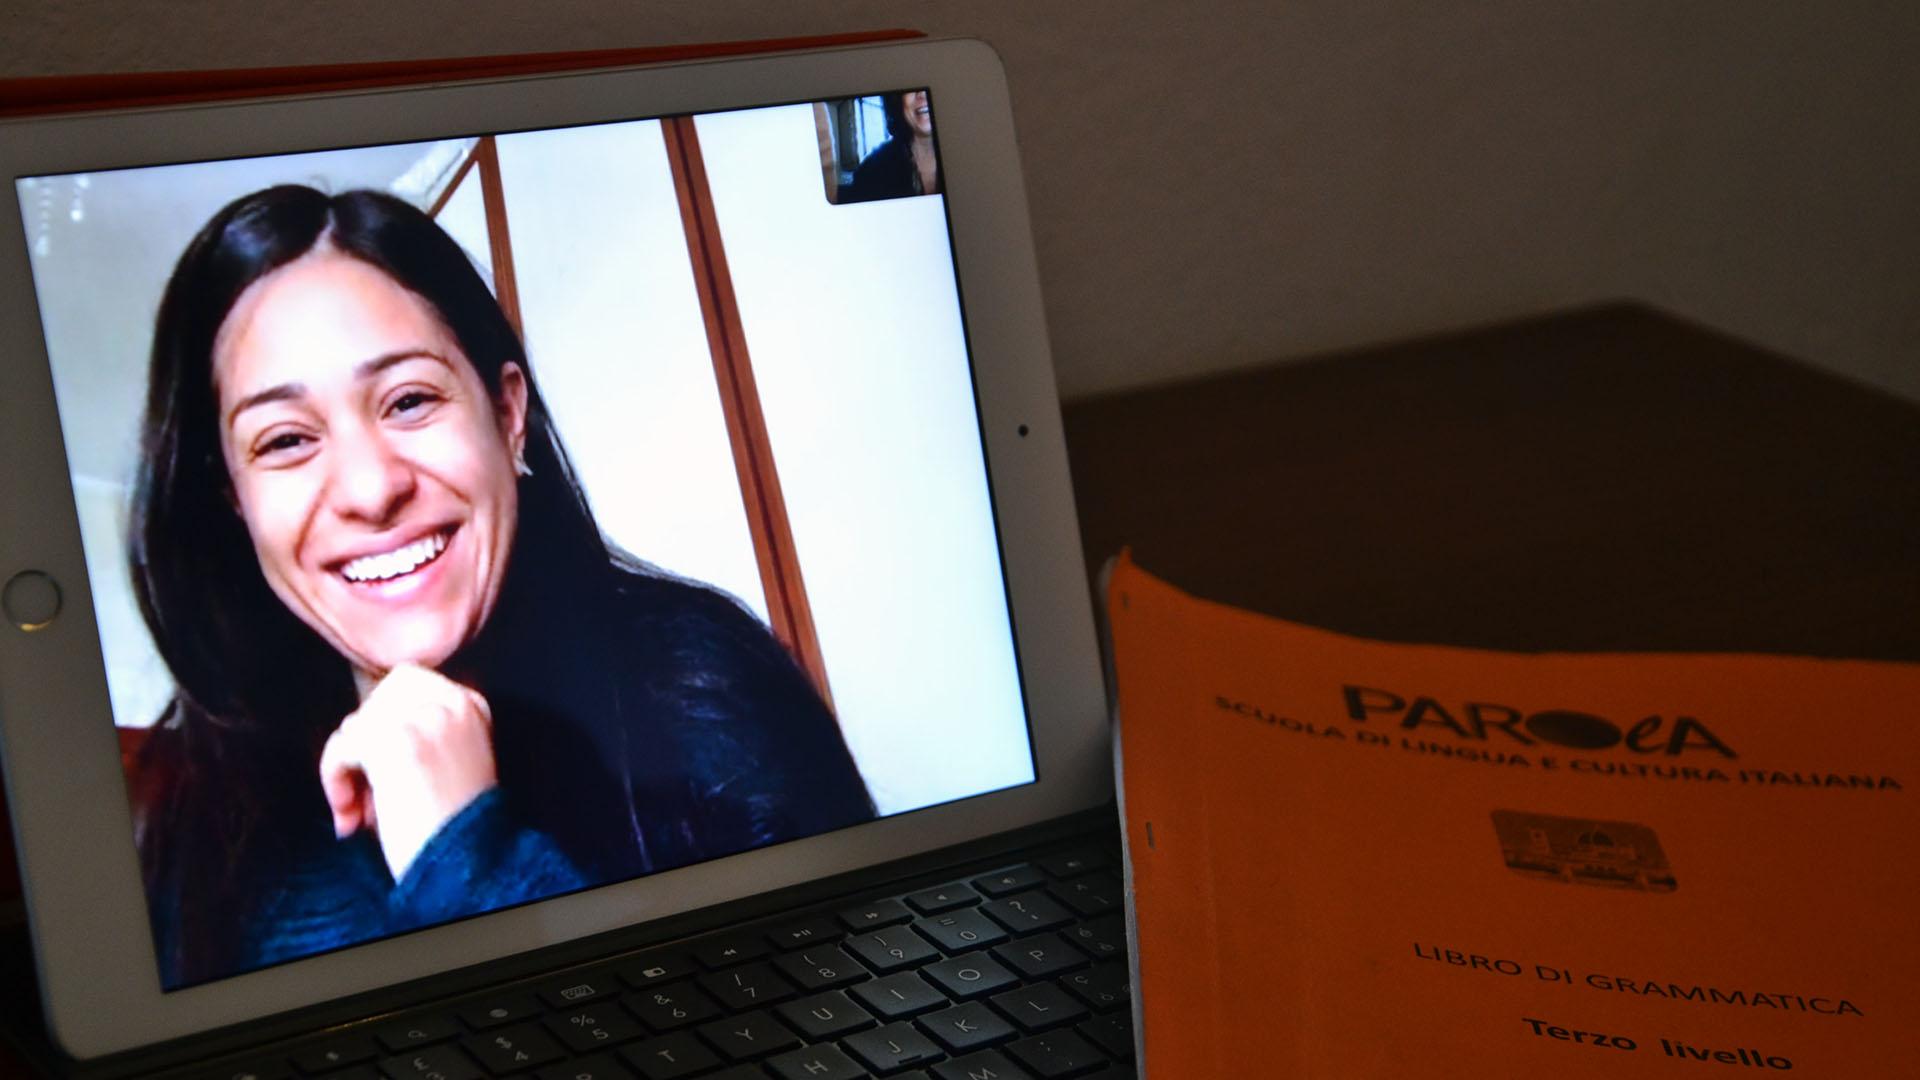 Online Italian language course of Parola school